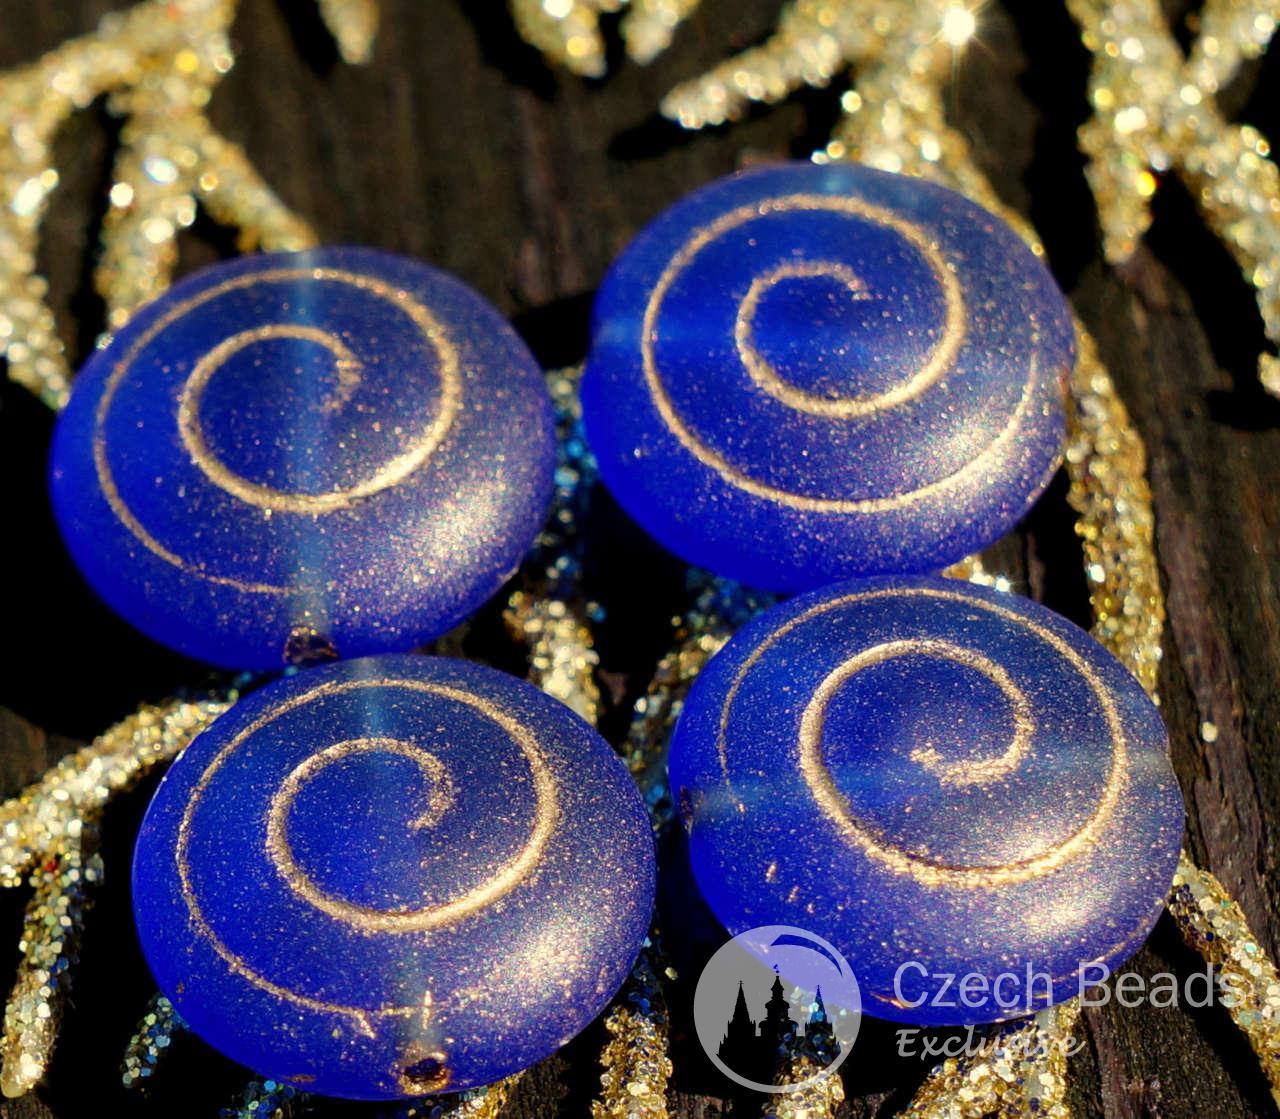 Mate Oro Azul Espiral de Cuentas de Cristal checo Nautilus Perlas de Vidrio Amonita Cordón Fósil de Amonita Perla de Concha de Perlas de Nautilus Concha de Mar de 13 mm 4 piezas para $ 1.87 de Czech Beads Exclusive